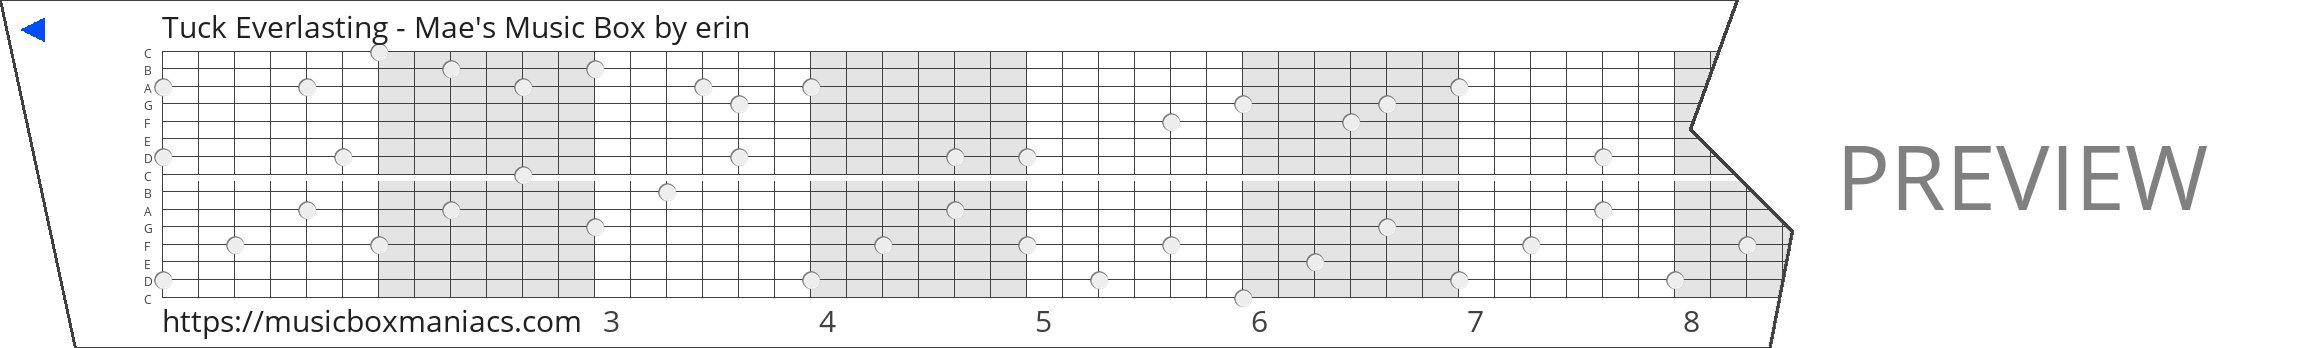 Tuck Everlasting - Mae's Music Box 15 note music box paper strip